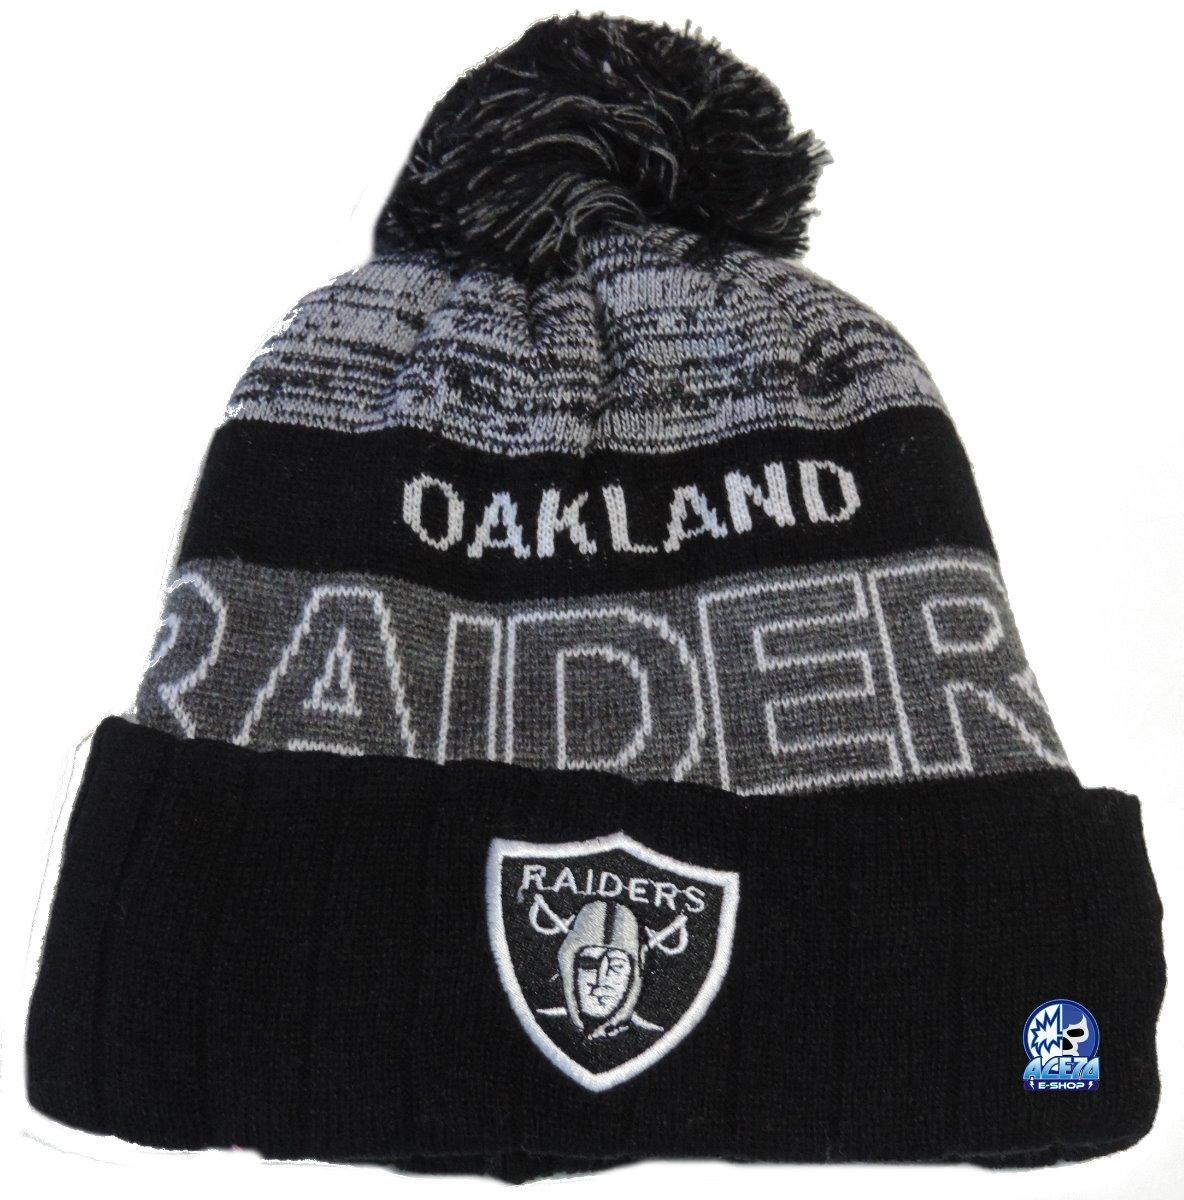 e43f429982ded Raiders De Oakland Gorro D Estambre Nac Envio Gts Nfl1 Ace70 ...